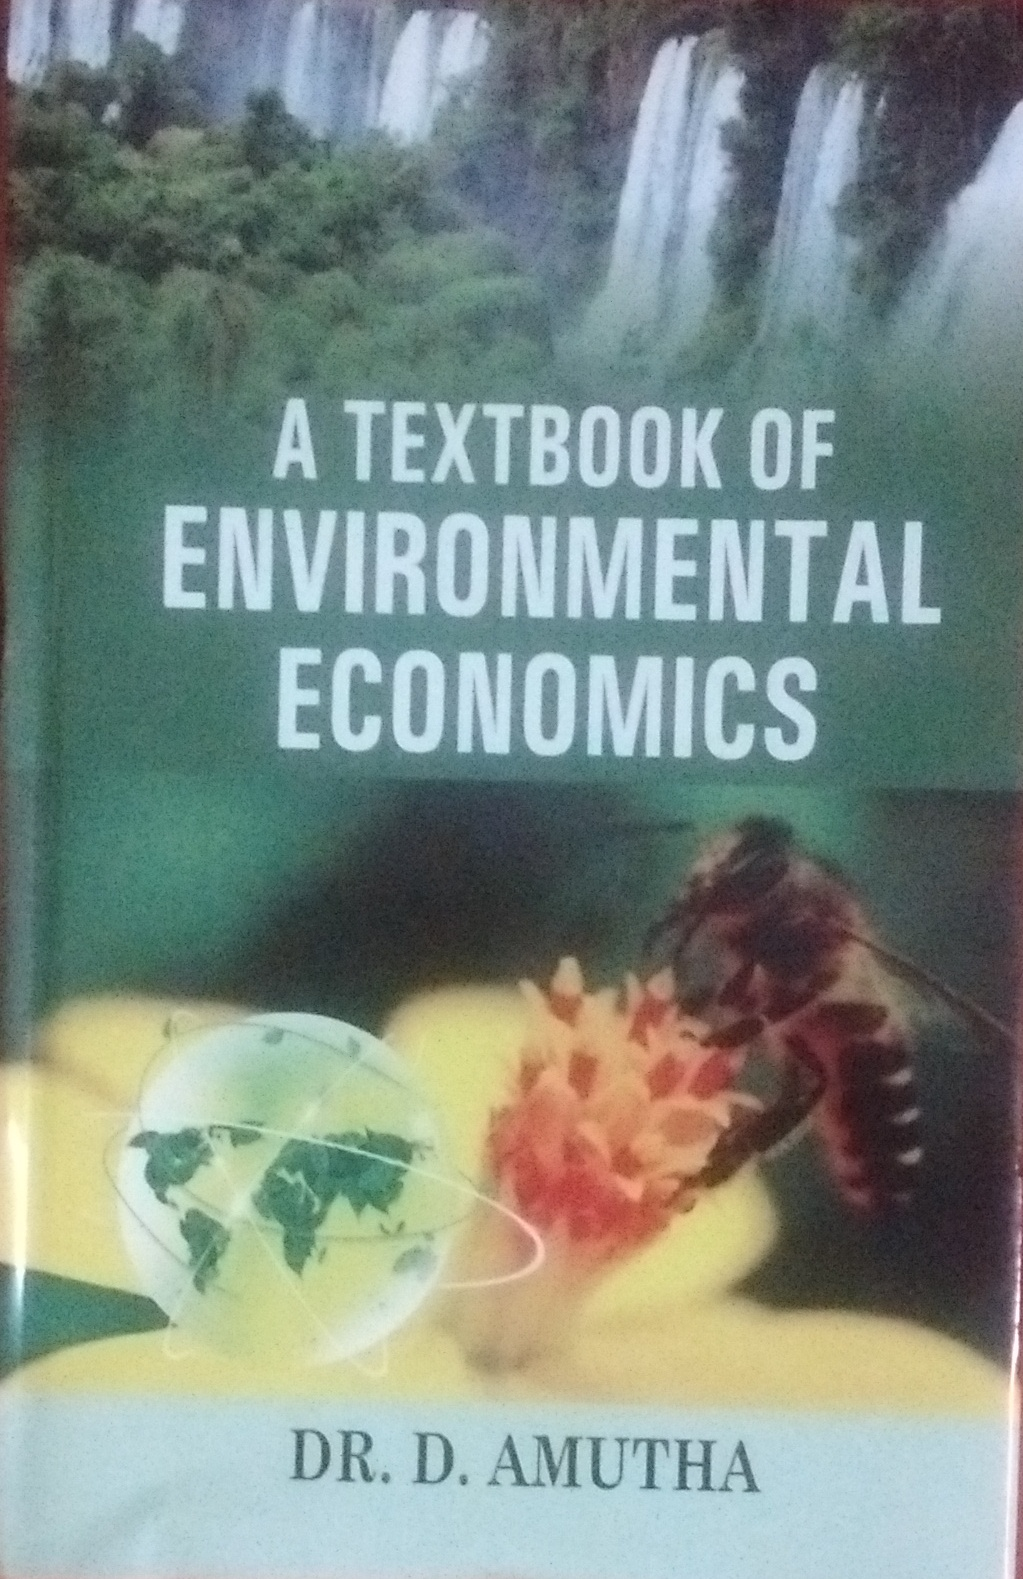 A Textbook of Environmental Economics